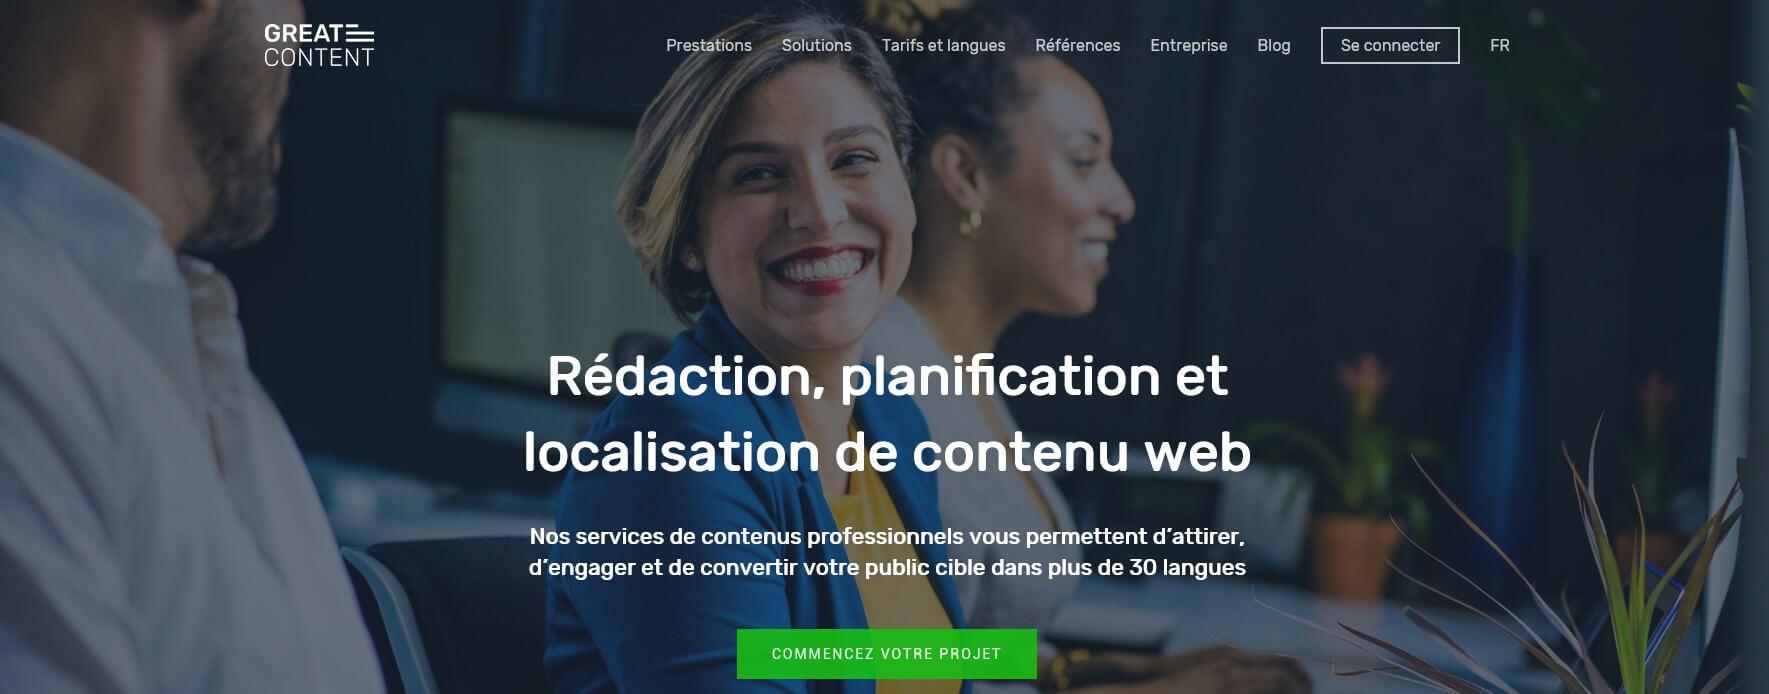 Plateforme freelance Greatcontent